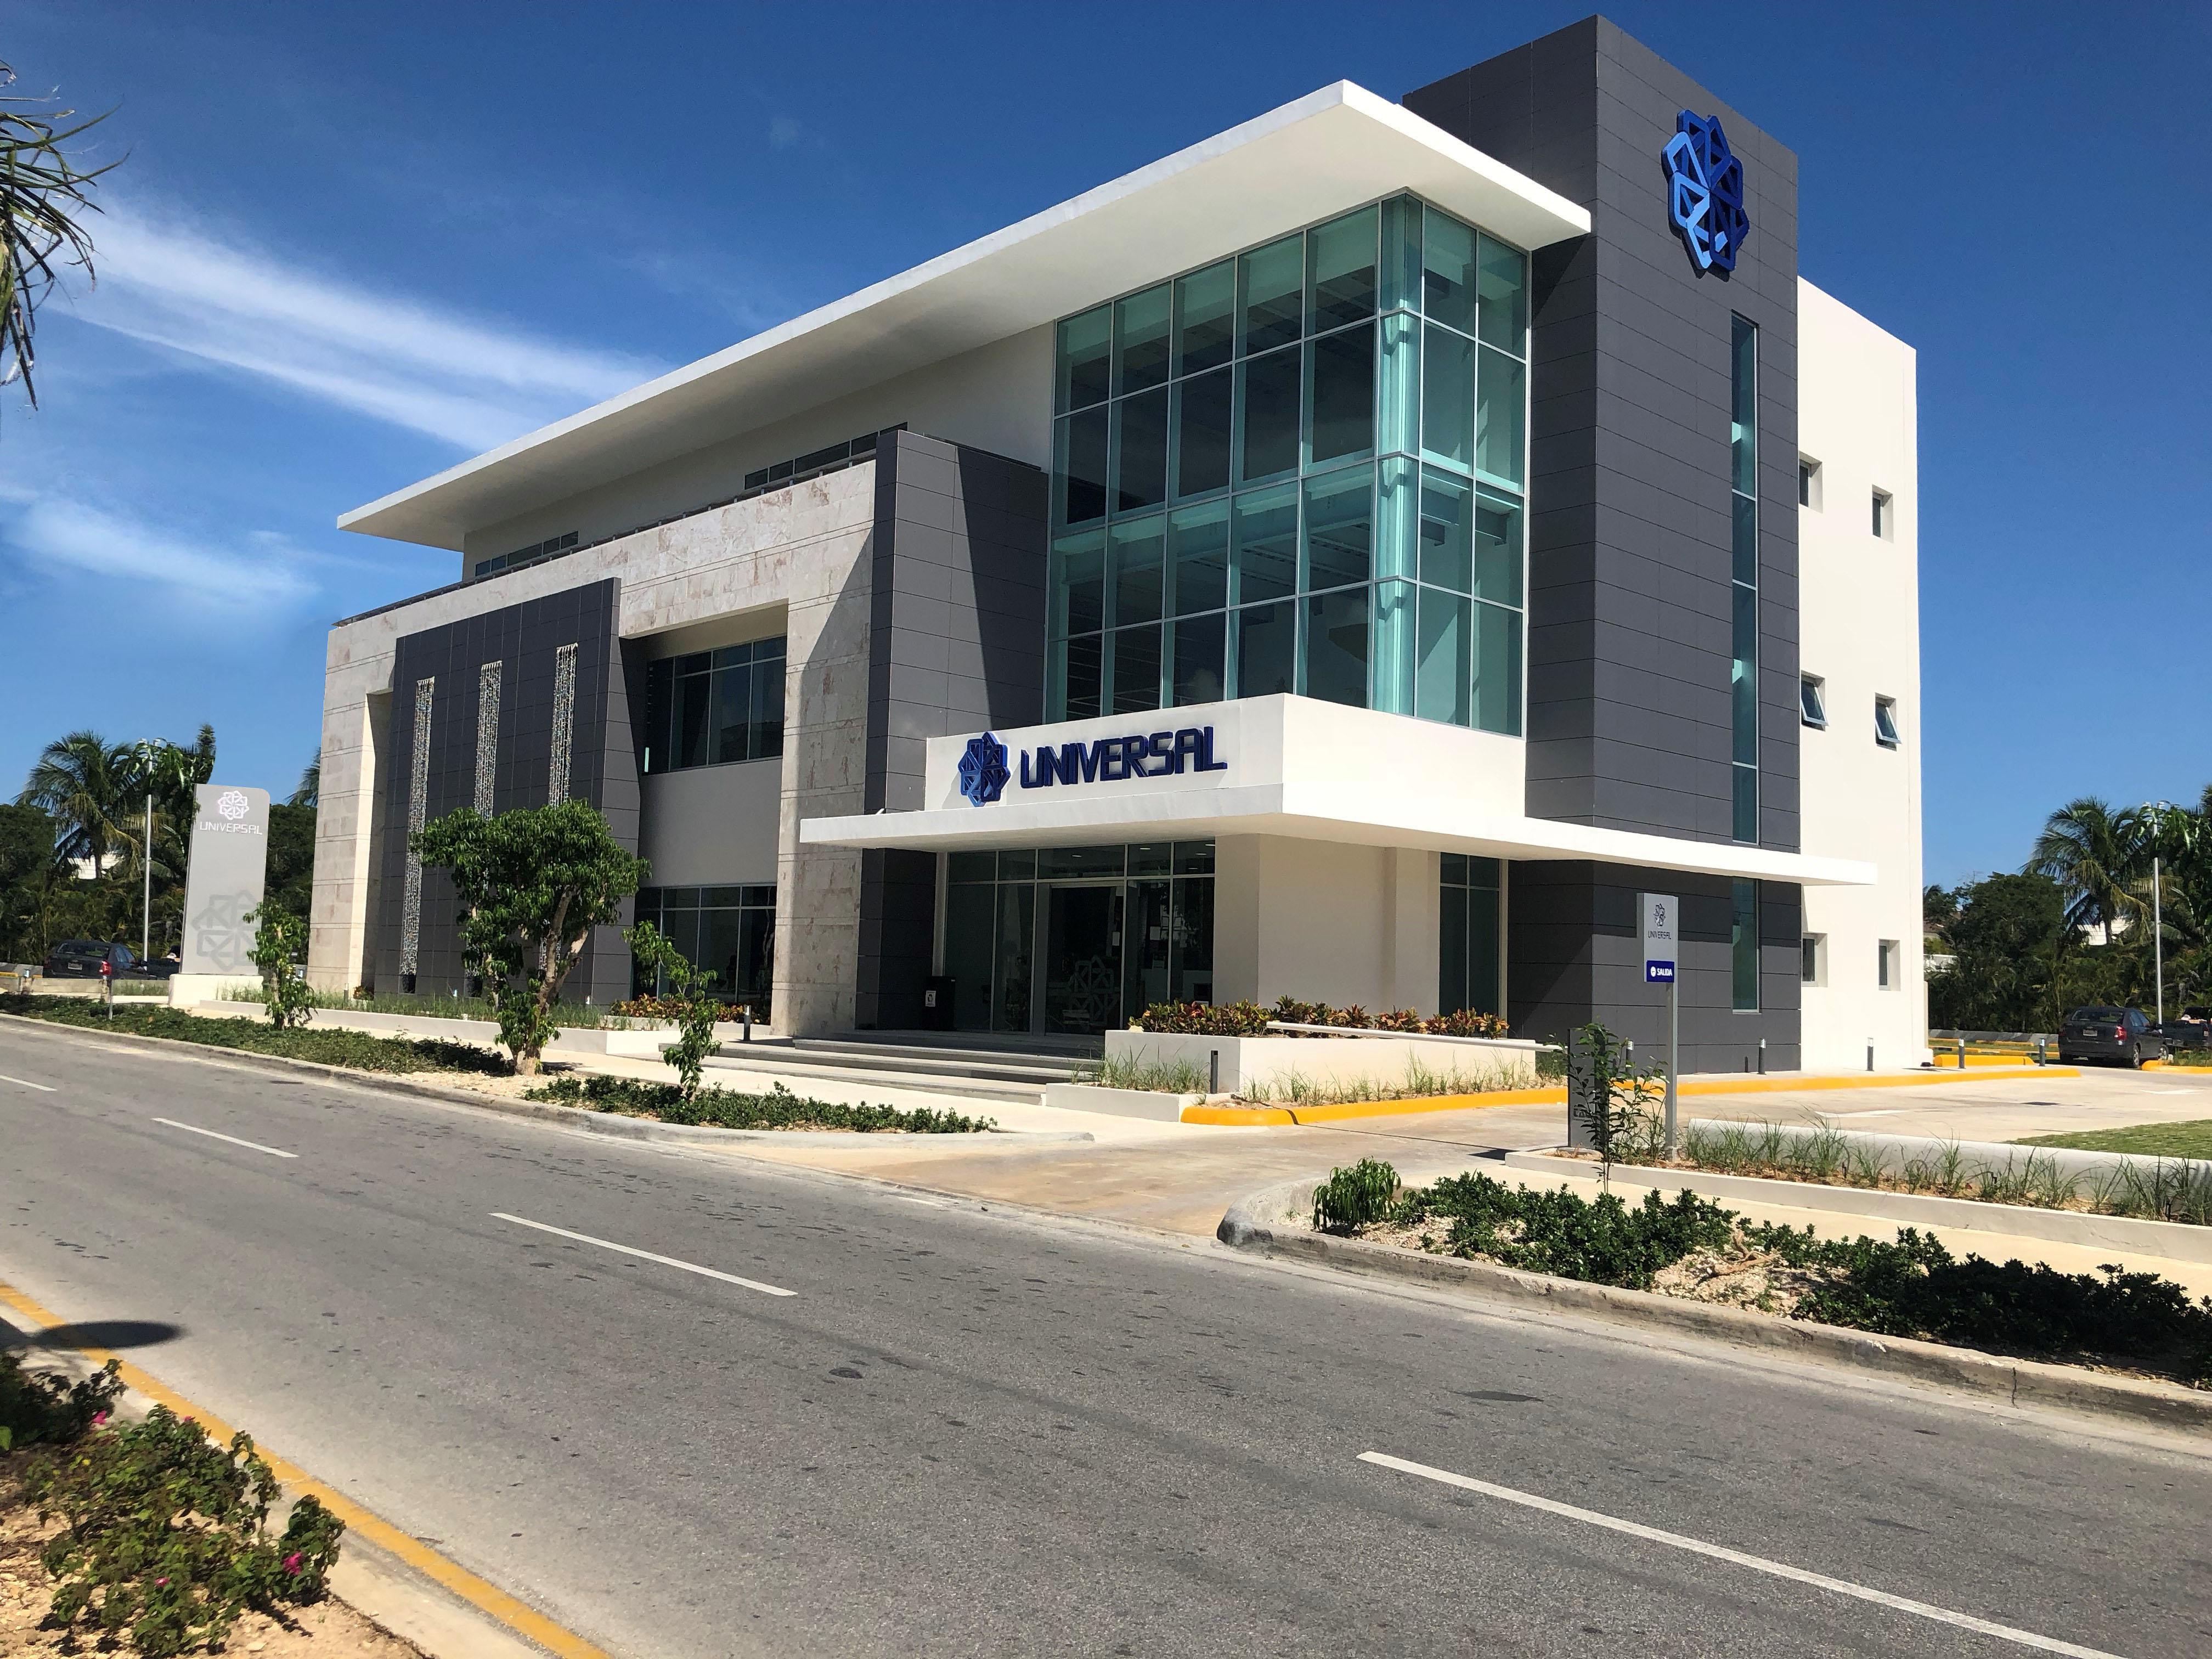 Seguros Universal Punta Cana